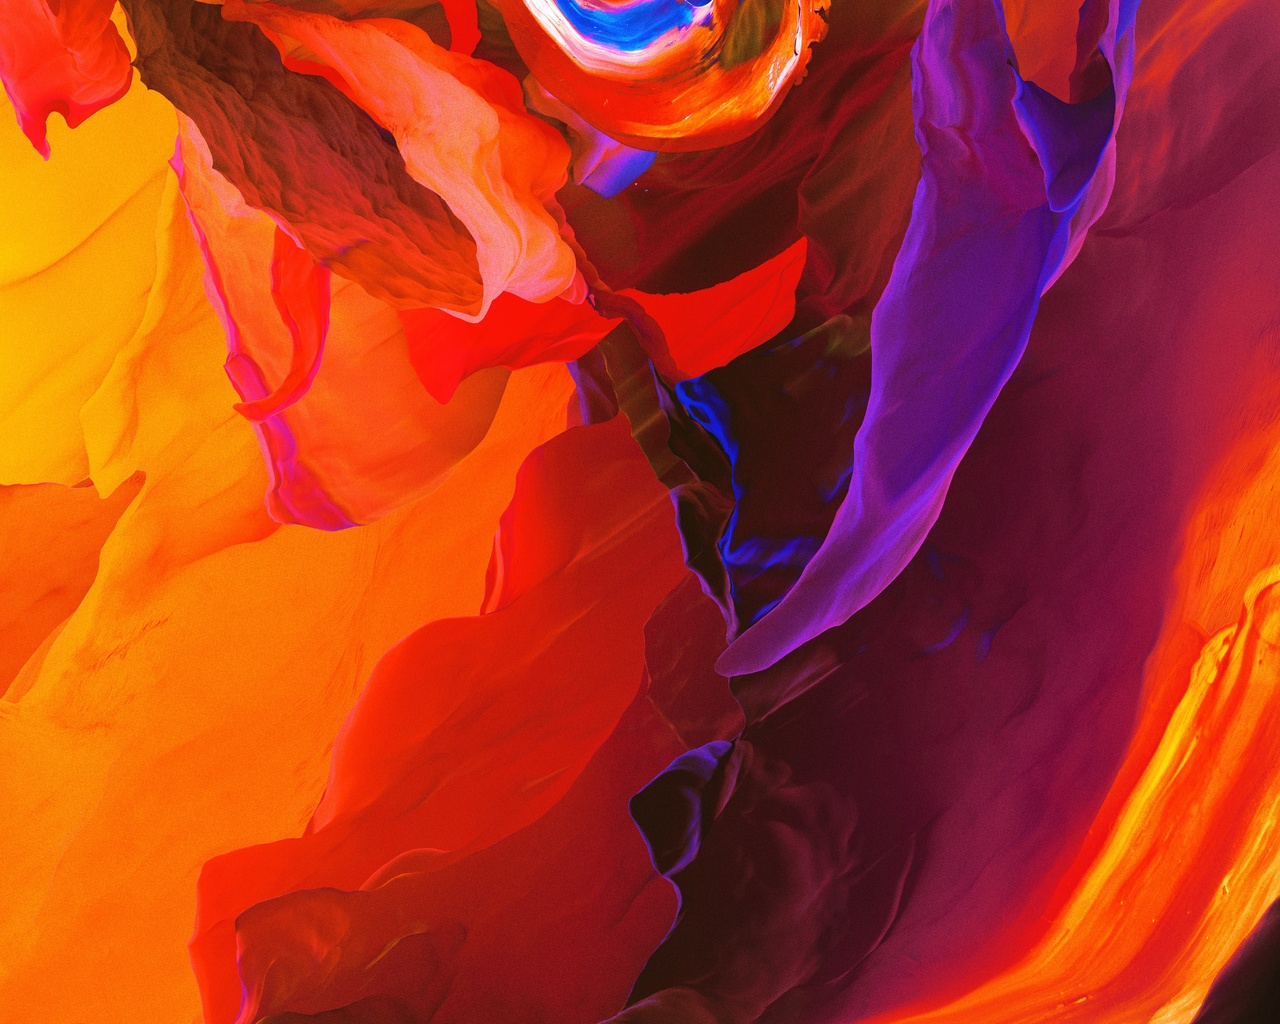 digital-abstract-colorful-8k-xq.jpg